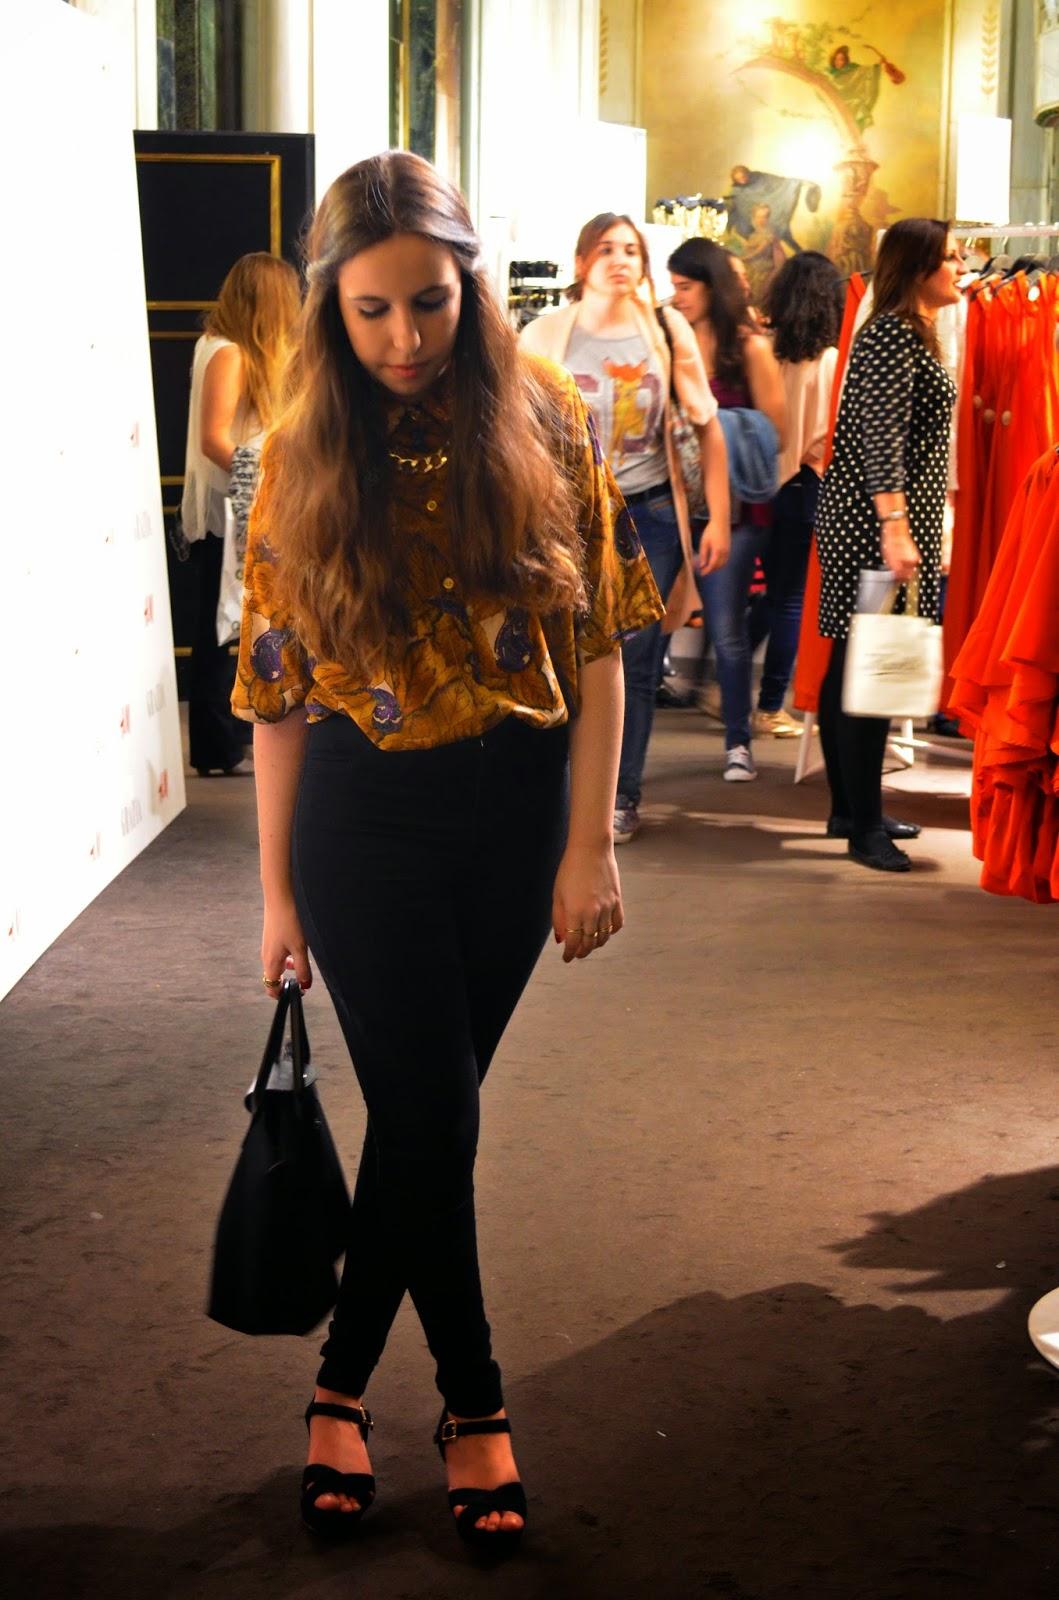 hey vicky hey, victoria suarez, h&m, conscious collection, vintage, hipster, hipster girl. estampado de hojas